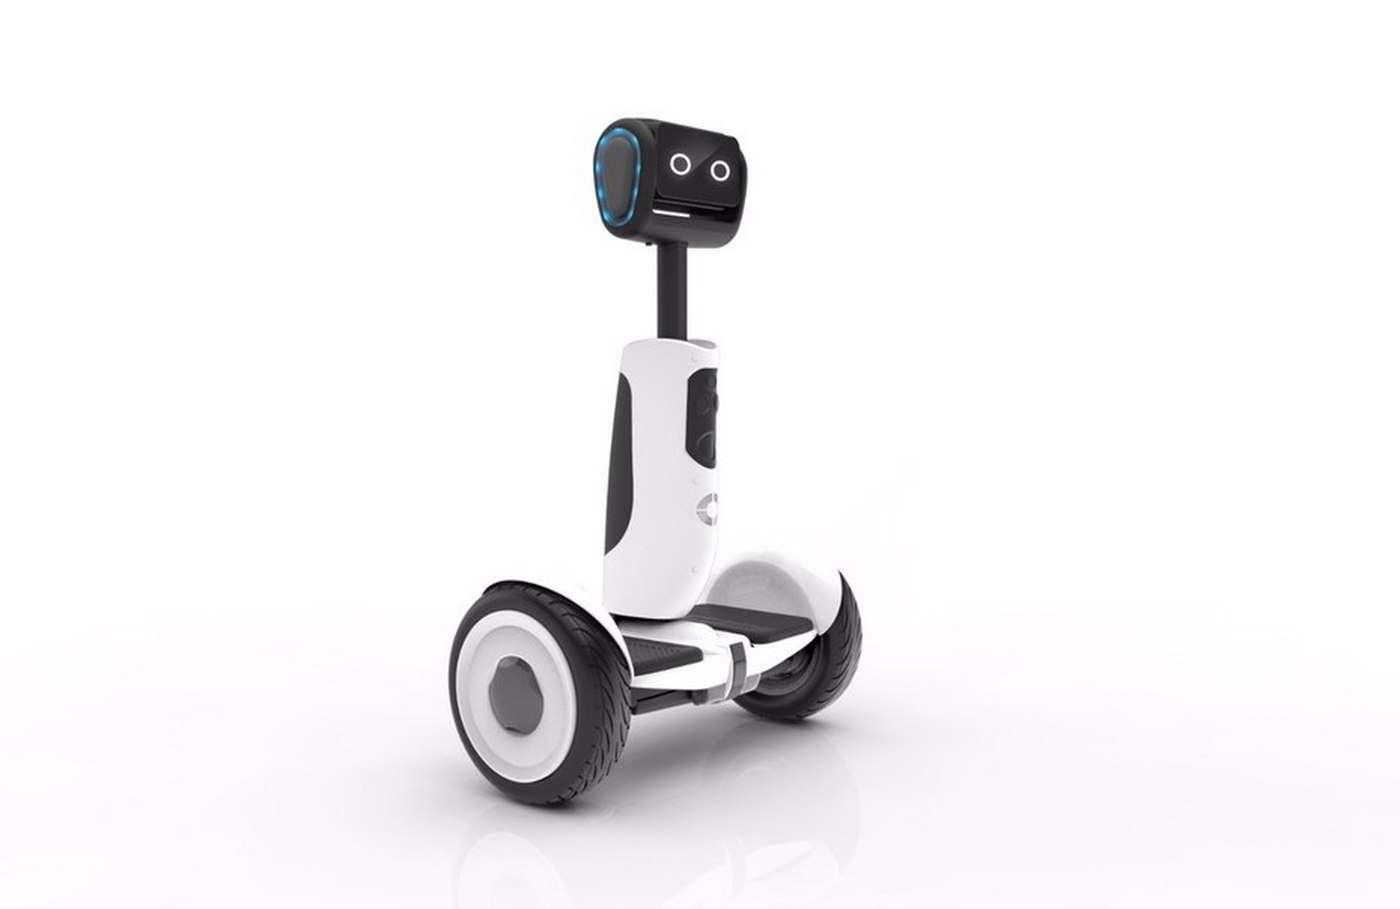 Ce sympathique petit robot se transforme en gyropode Segway et vice versa. © Segway Inc.